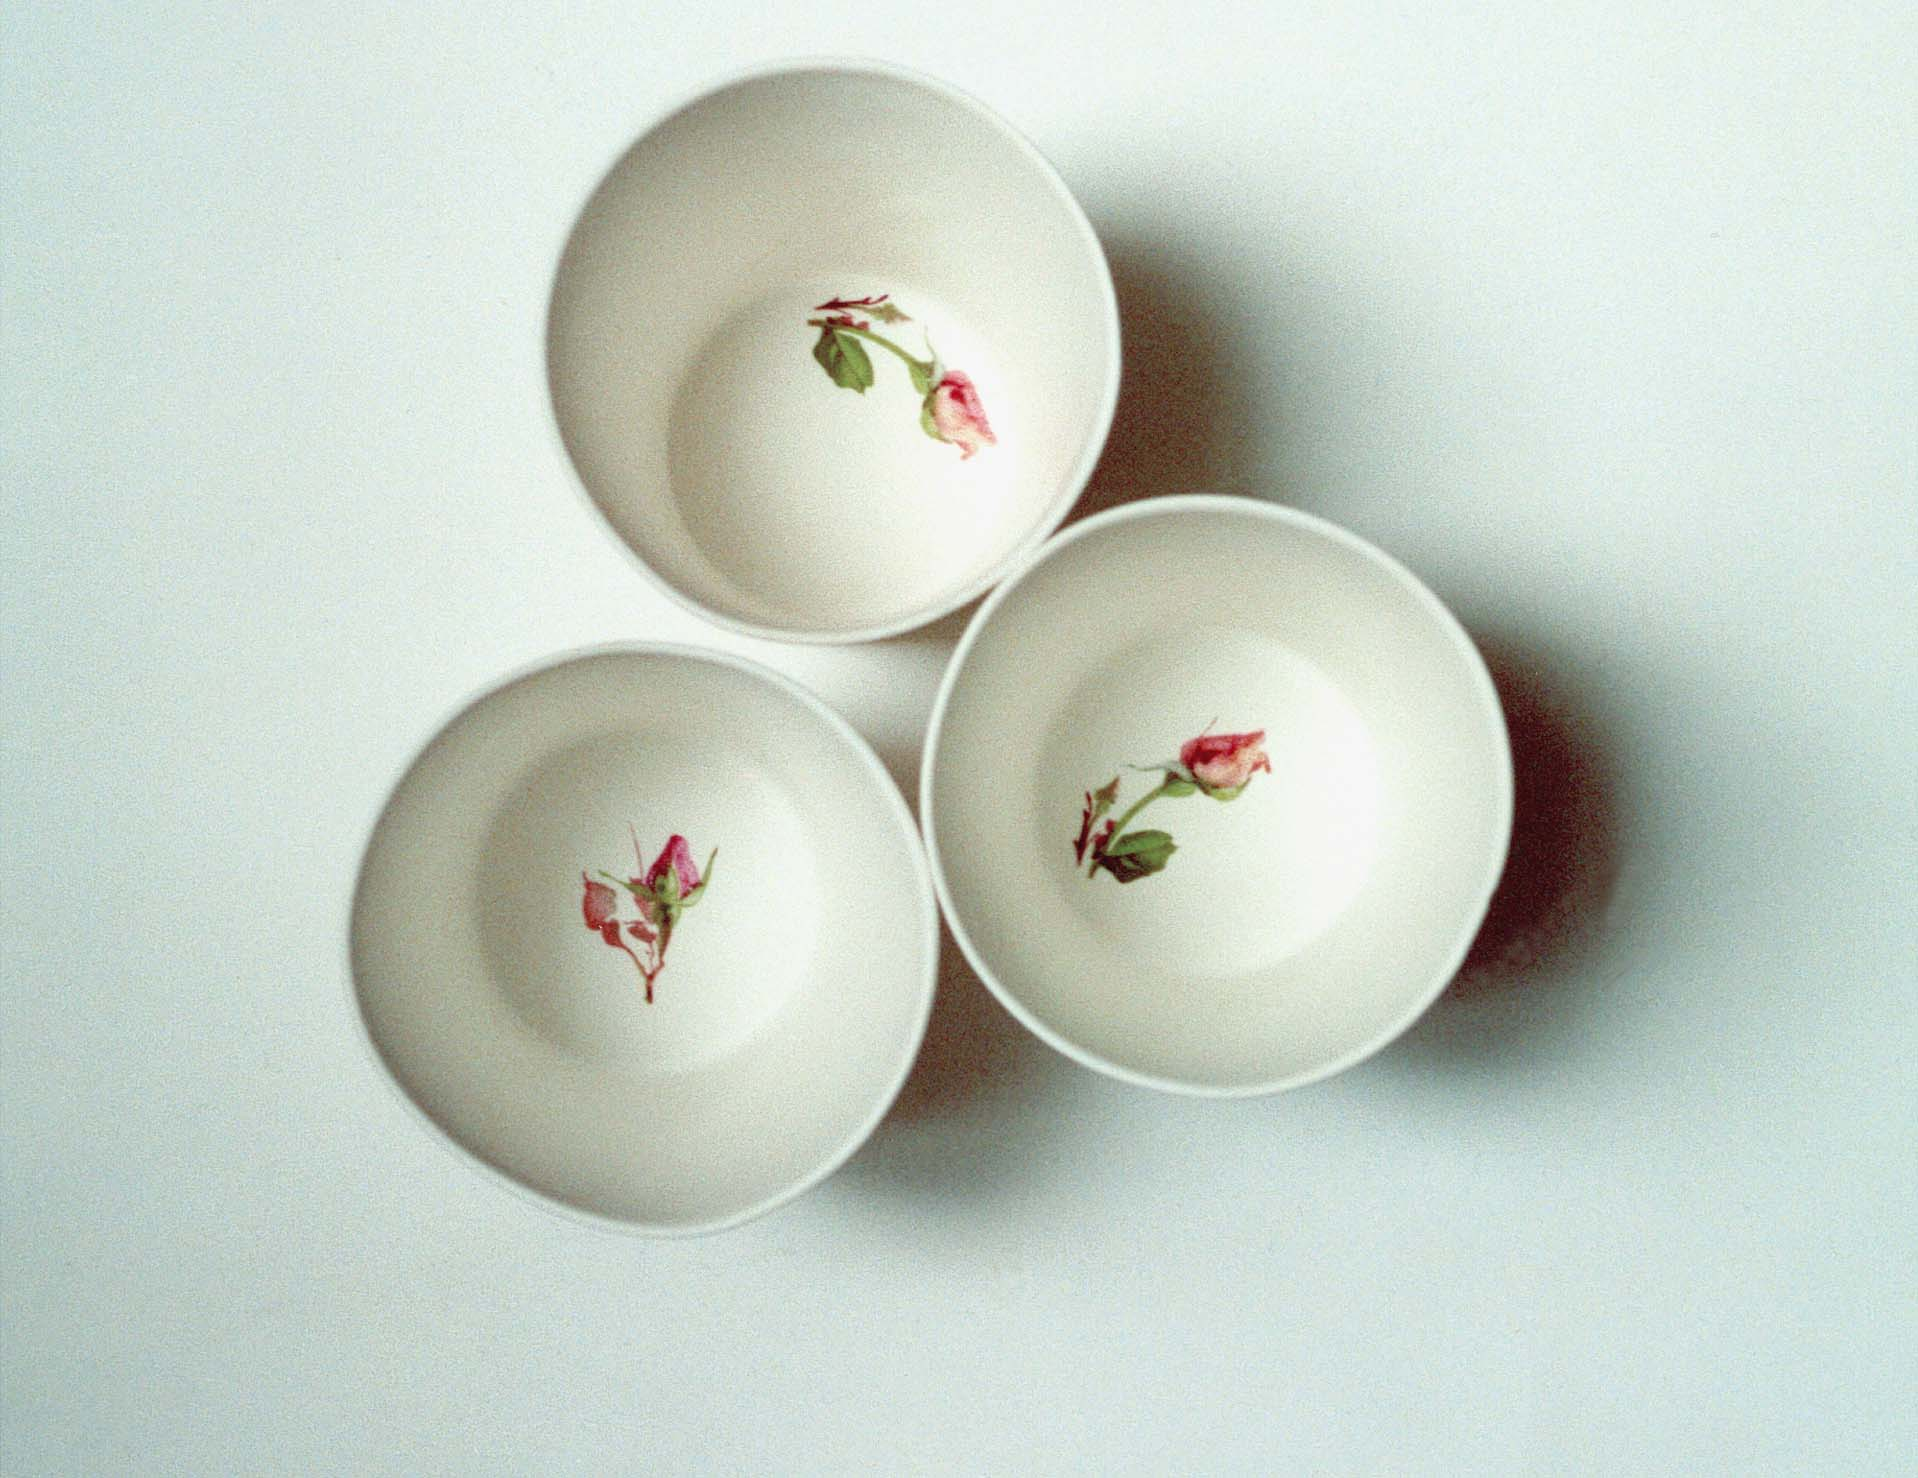 porcelaine_les objets roses_Lucile Soufflet_2